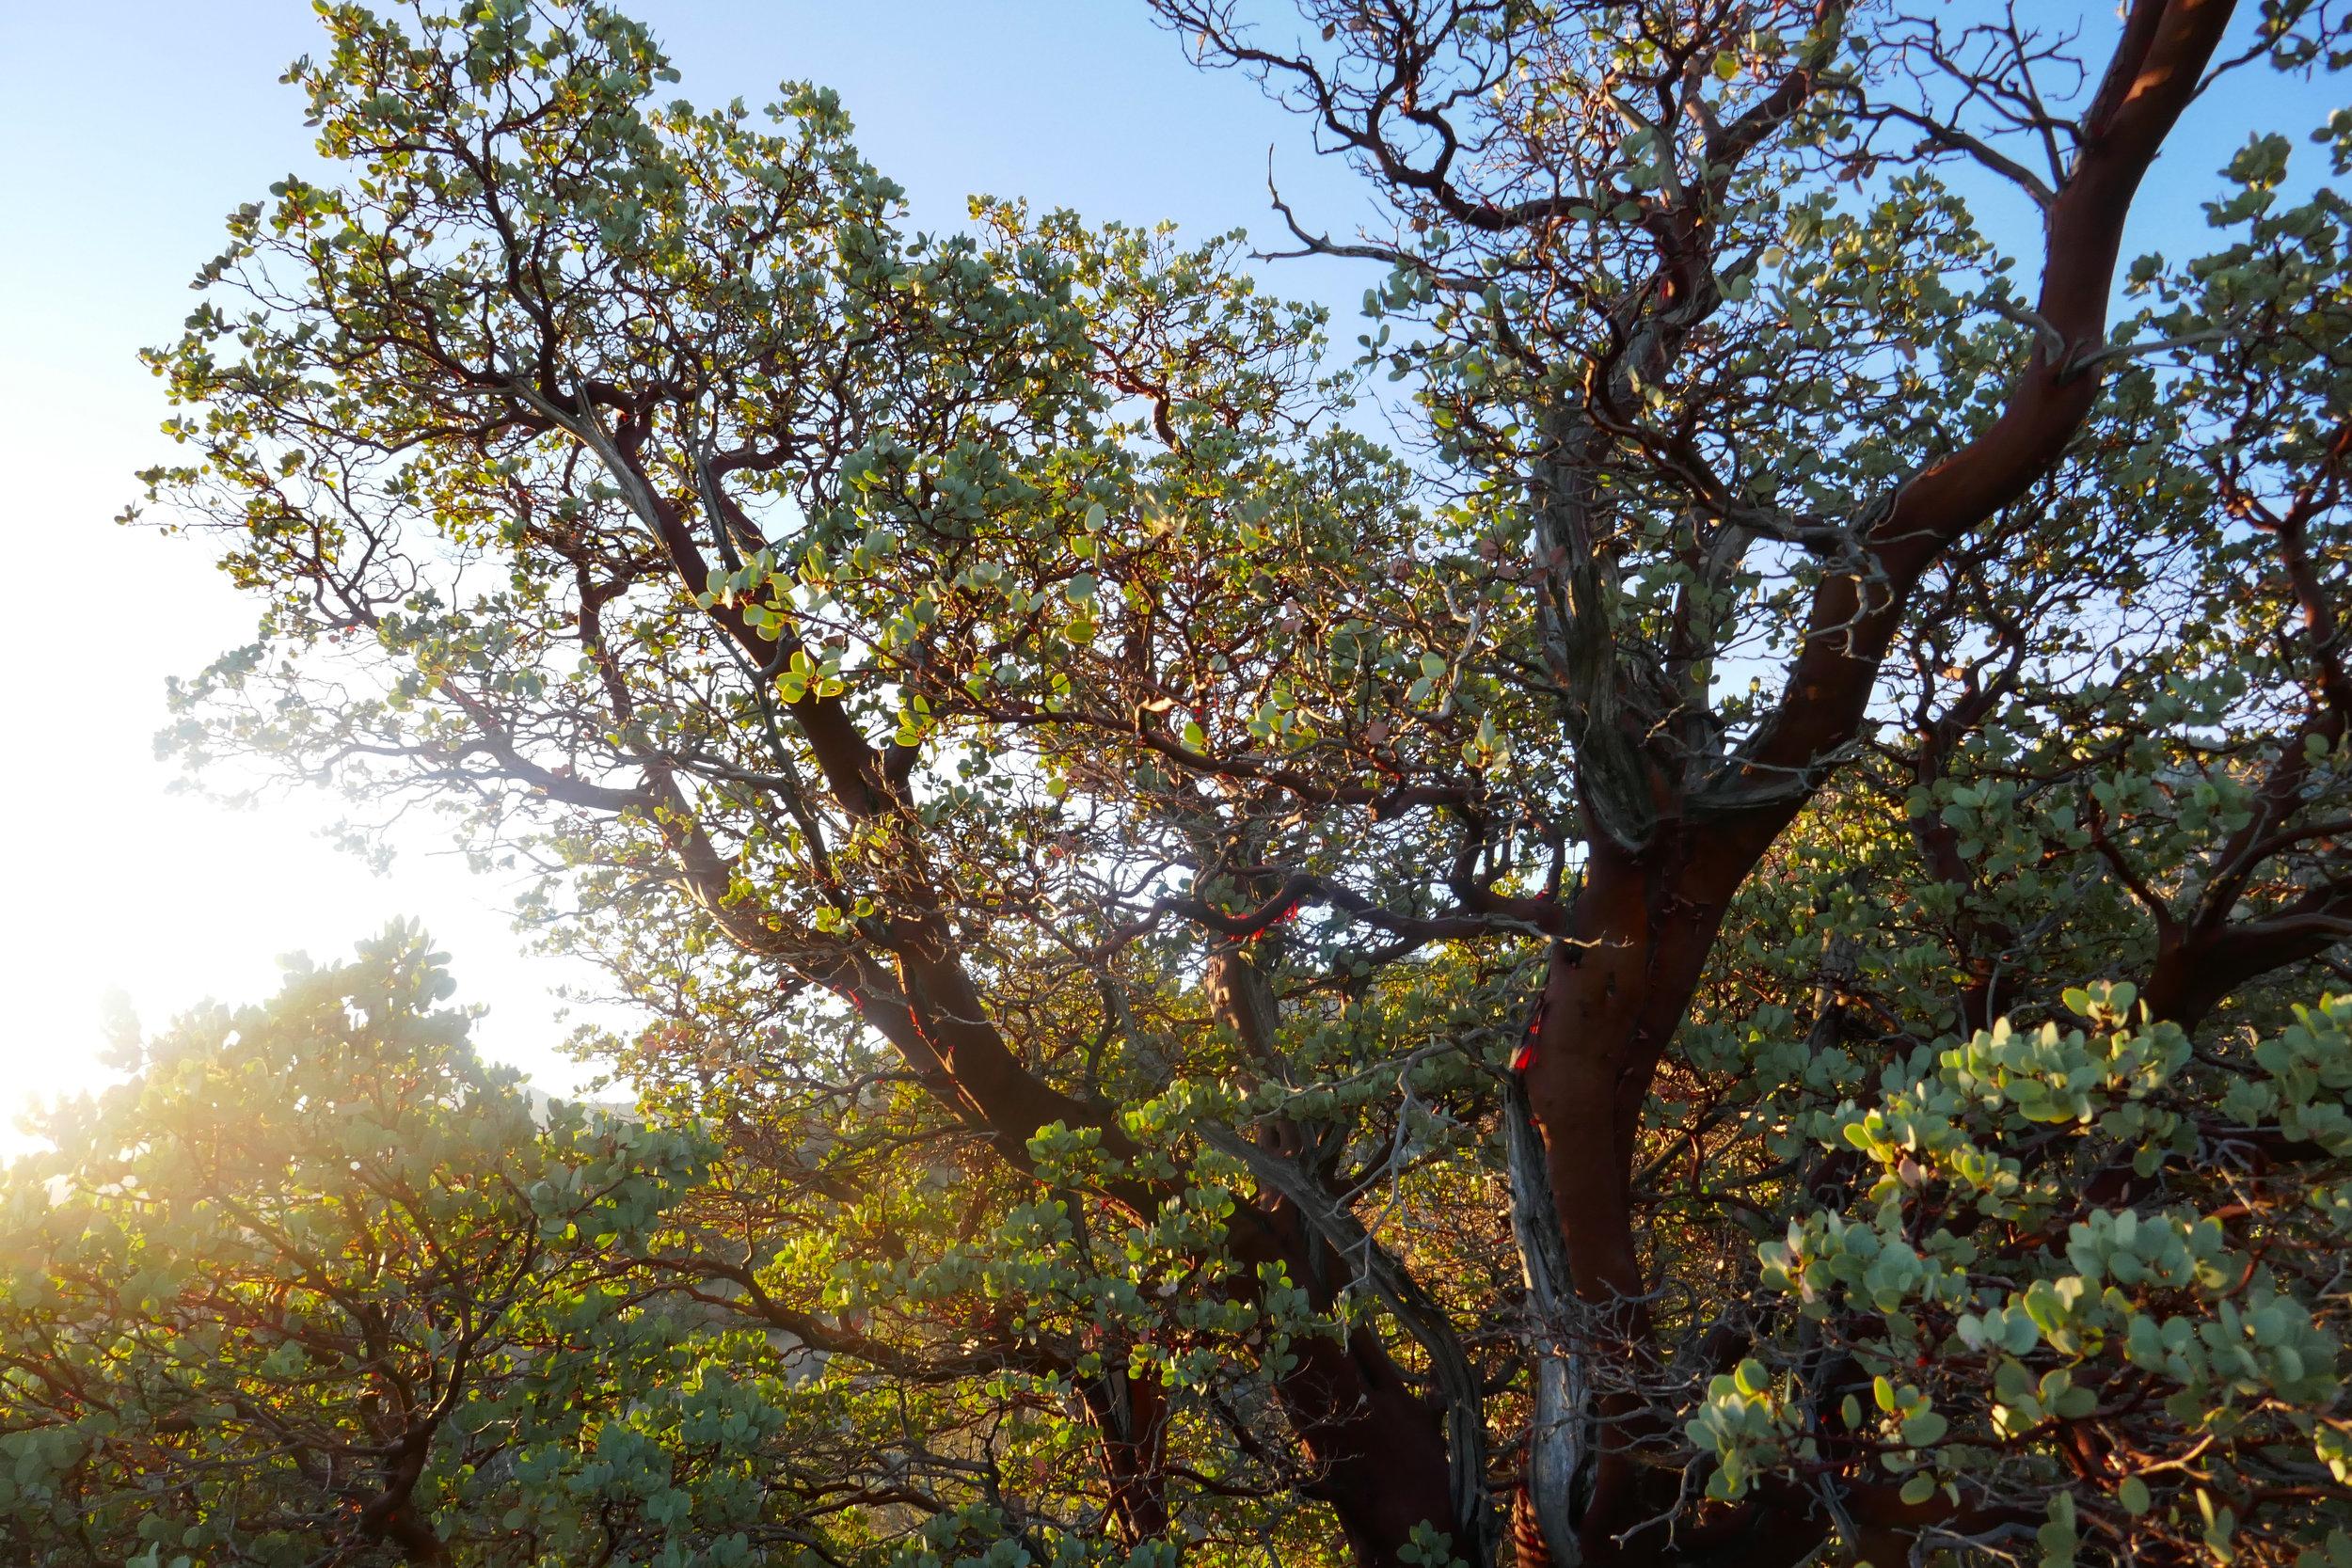 Manzanita in the morning light.